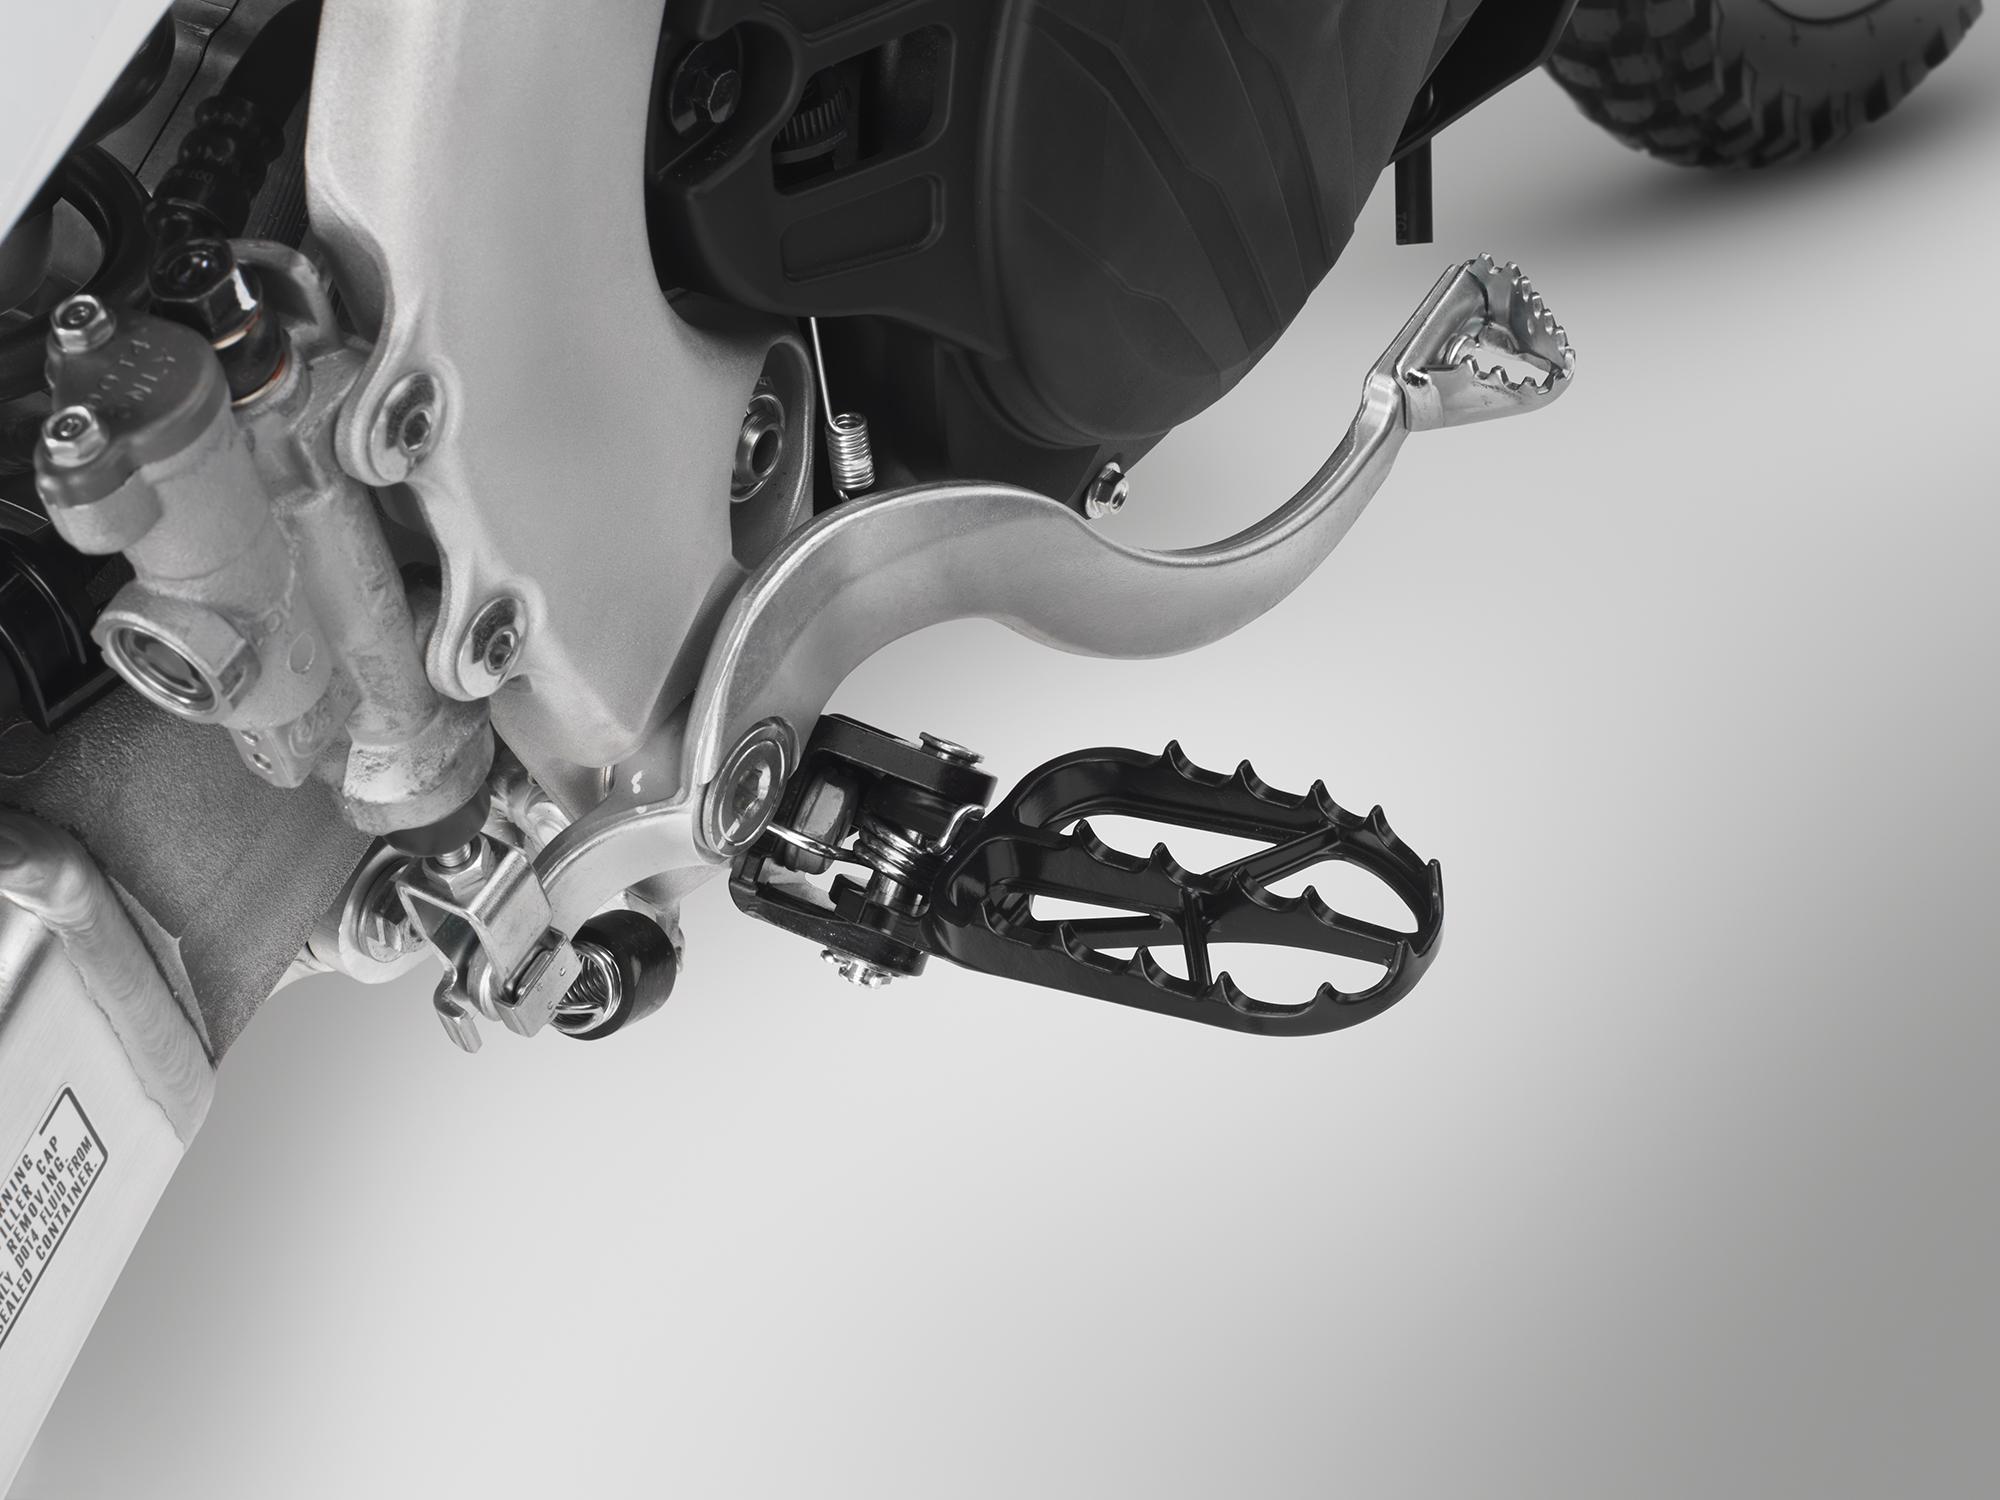 19 Honda CRF450L_footpeg R.jpg